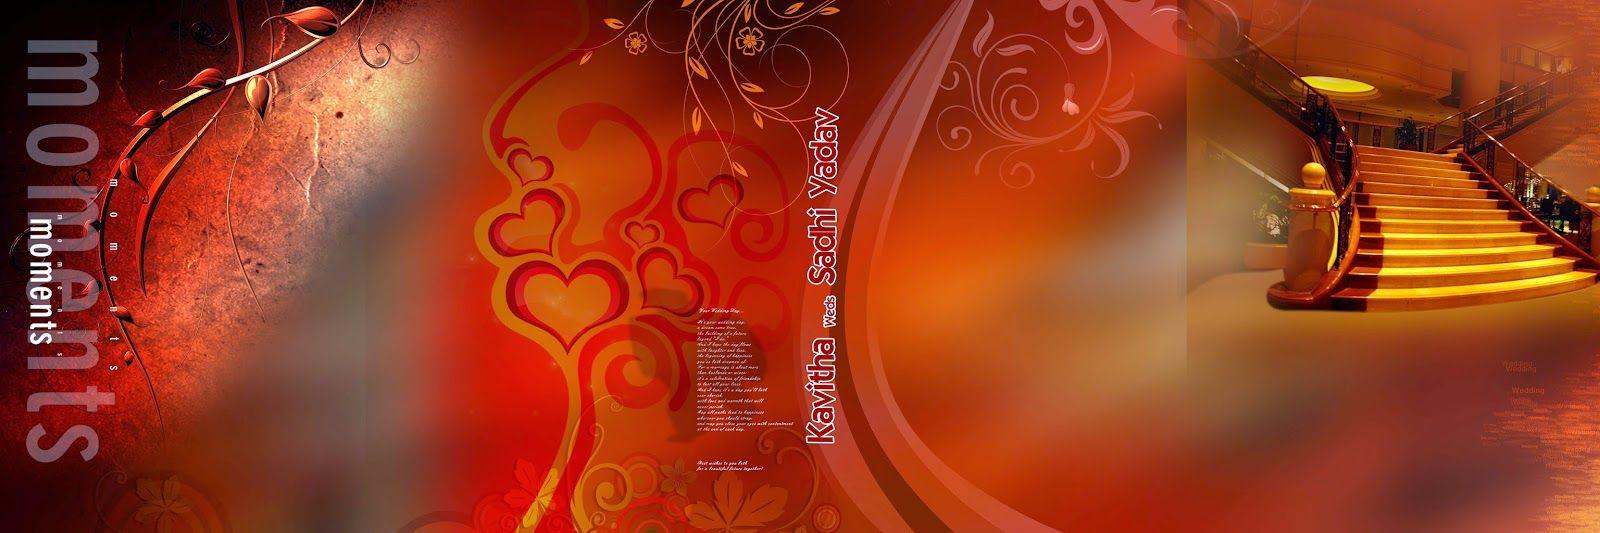 NaveenGFX.com: 12x36 Album PSD File free download